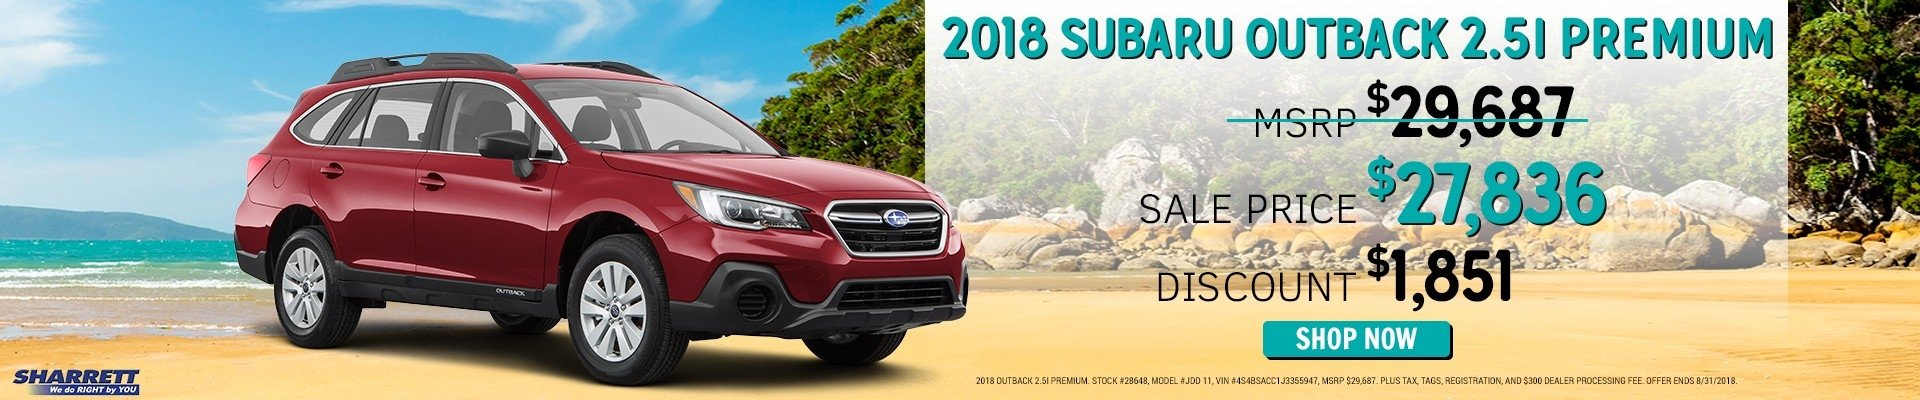 Get a new 2018 Subaru Outback 2.5I Premium | Sharrett Subaru